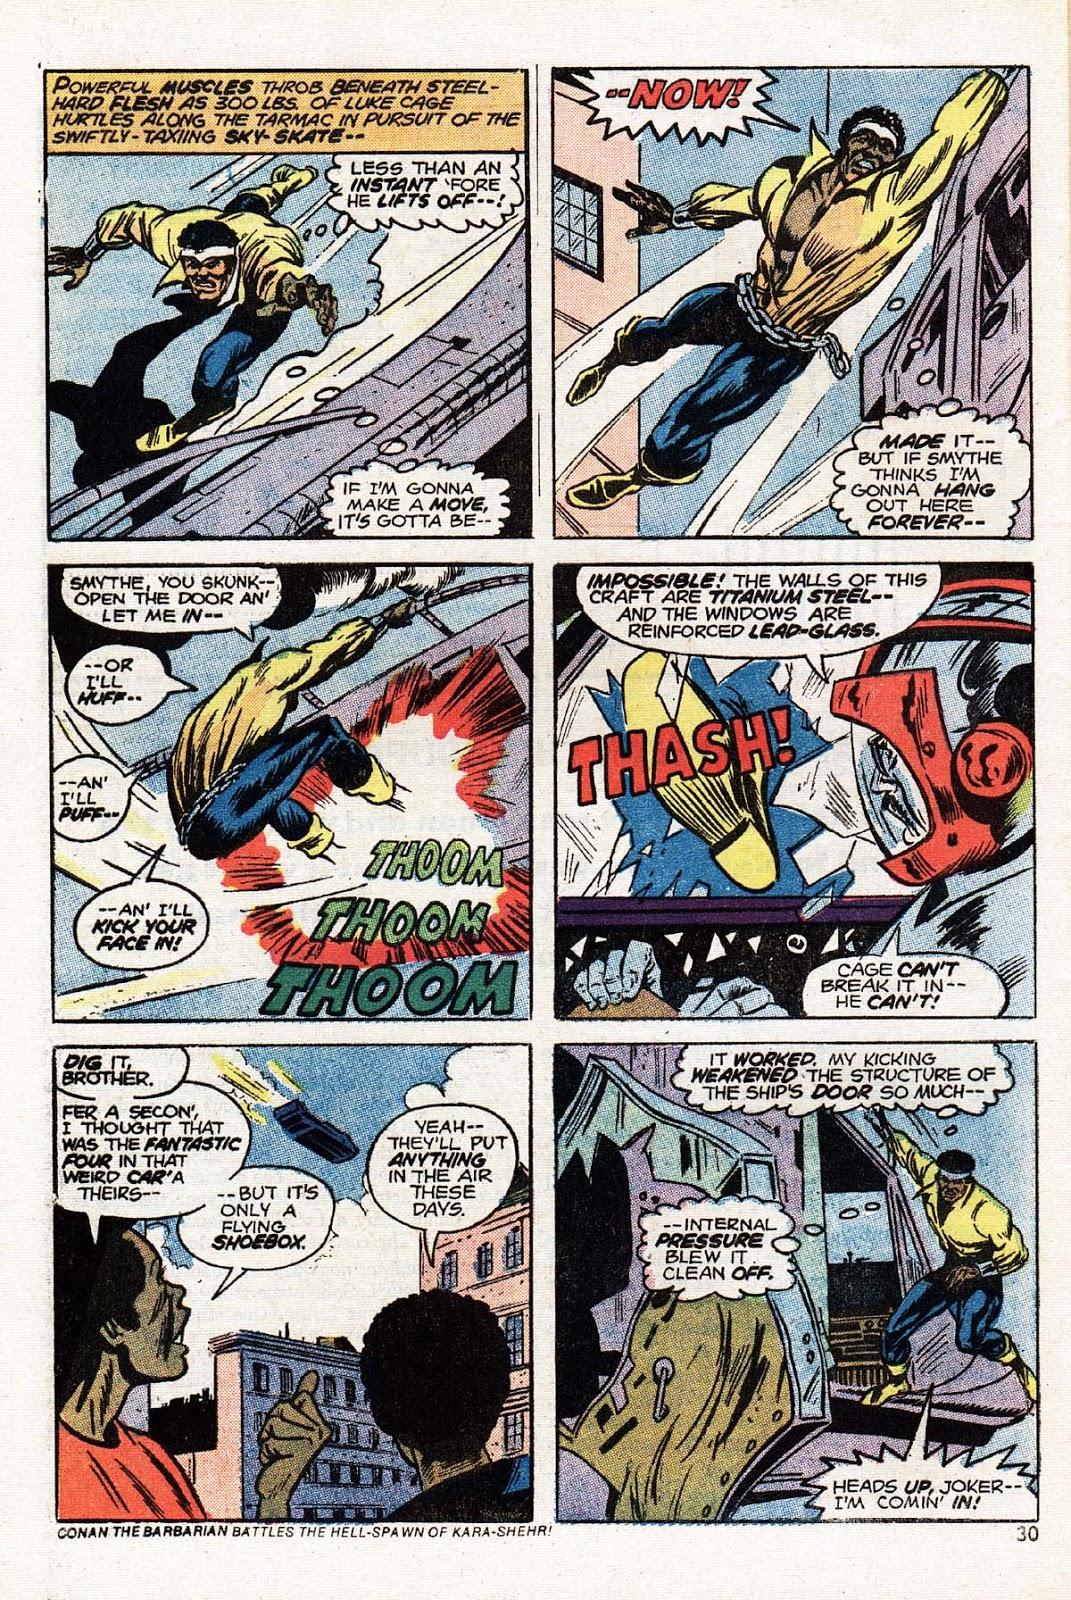 In 'Power Man' (1974) #17, Luke Cage barrels through titanium doors to stop Orville Smythe flying a sky-skate.